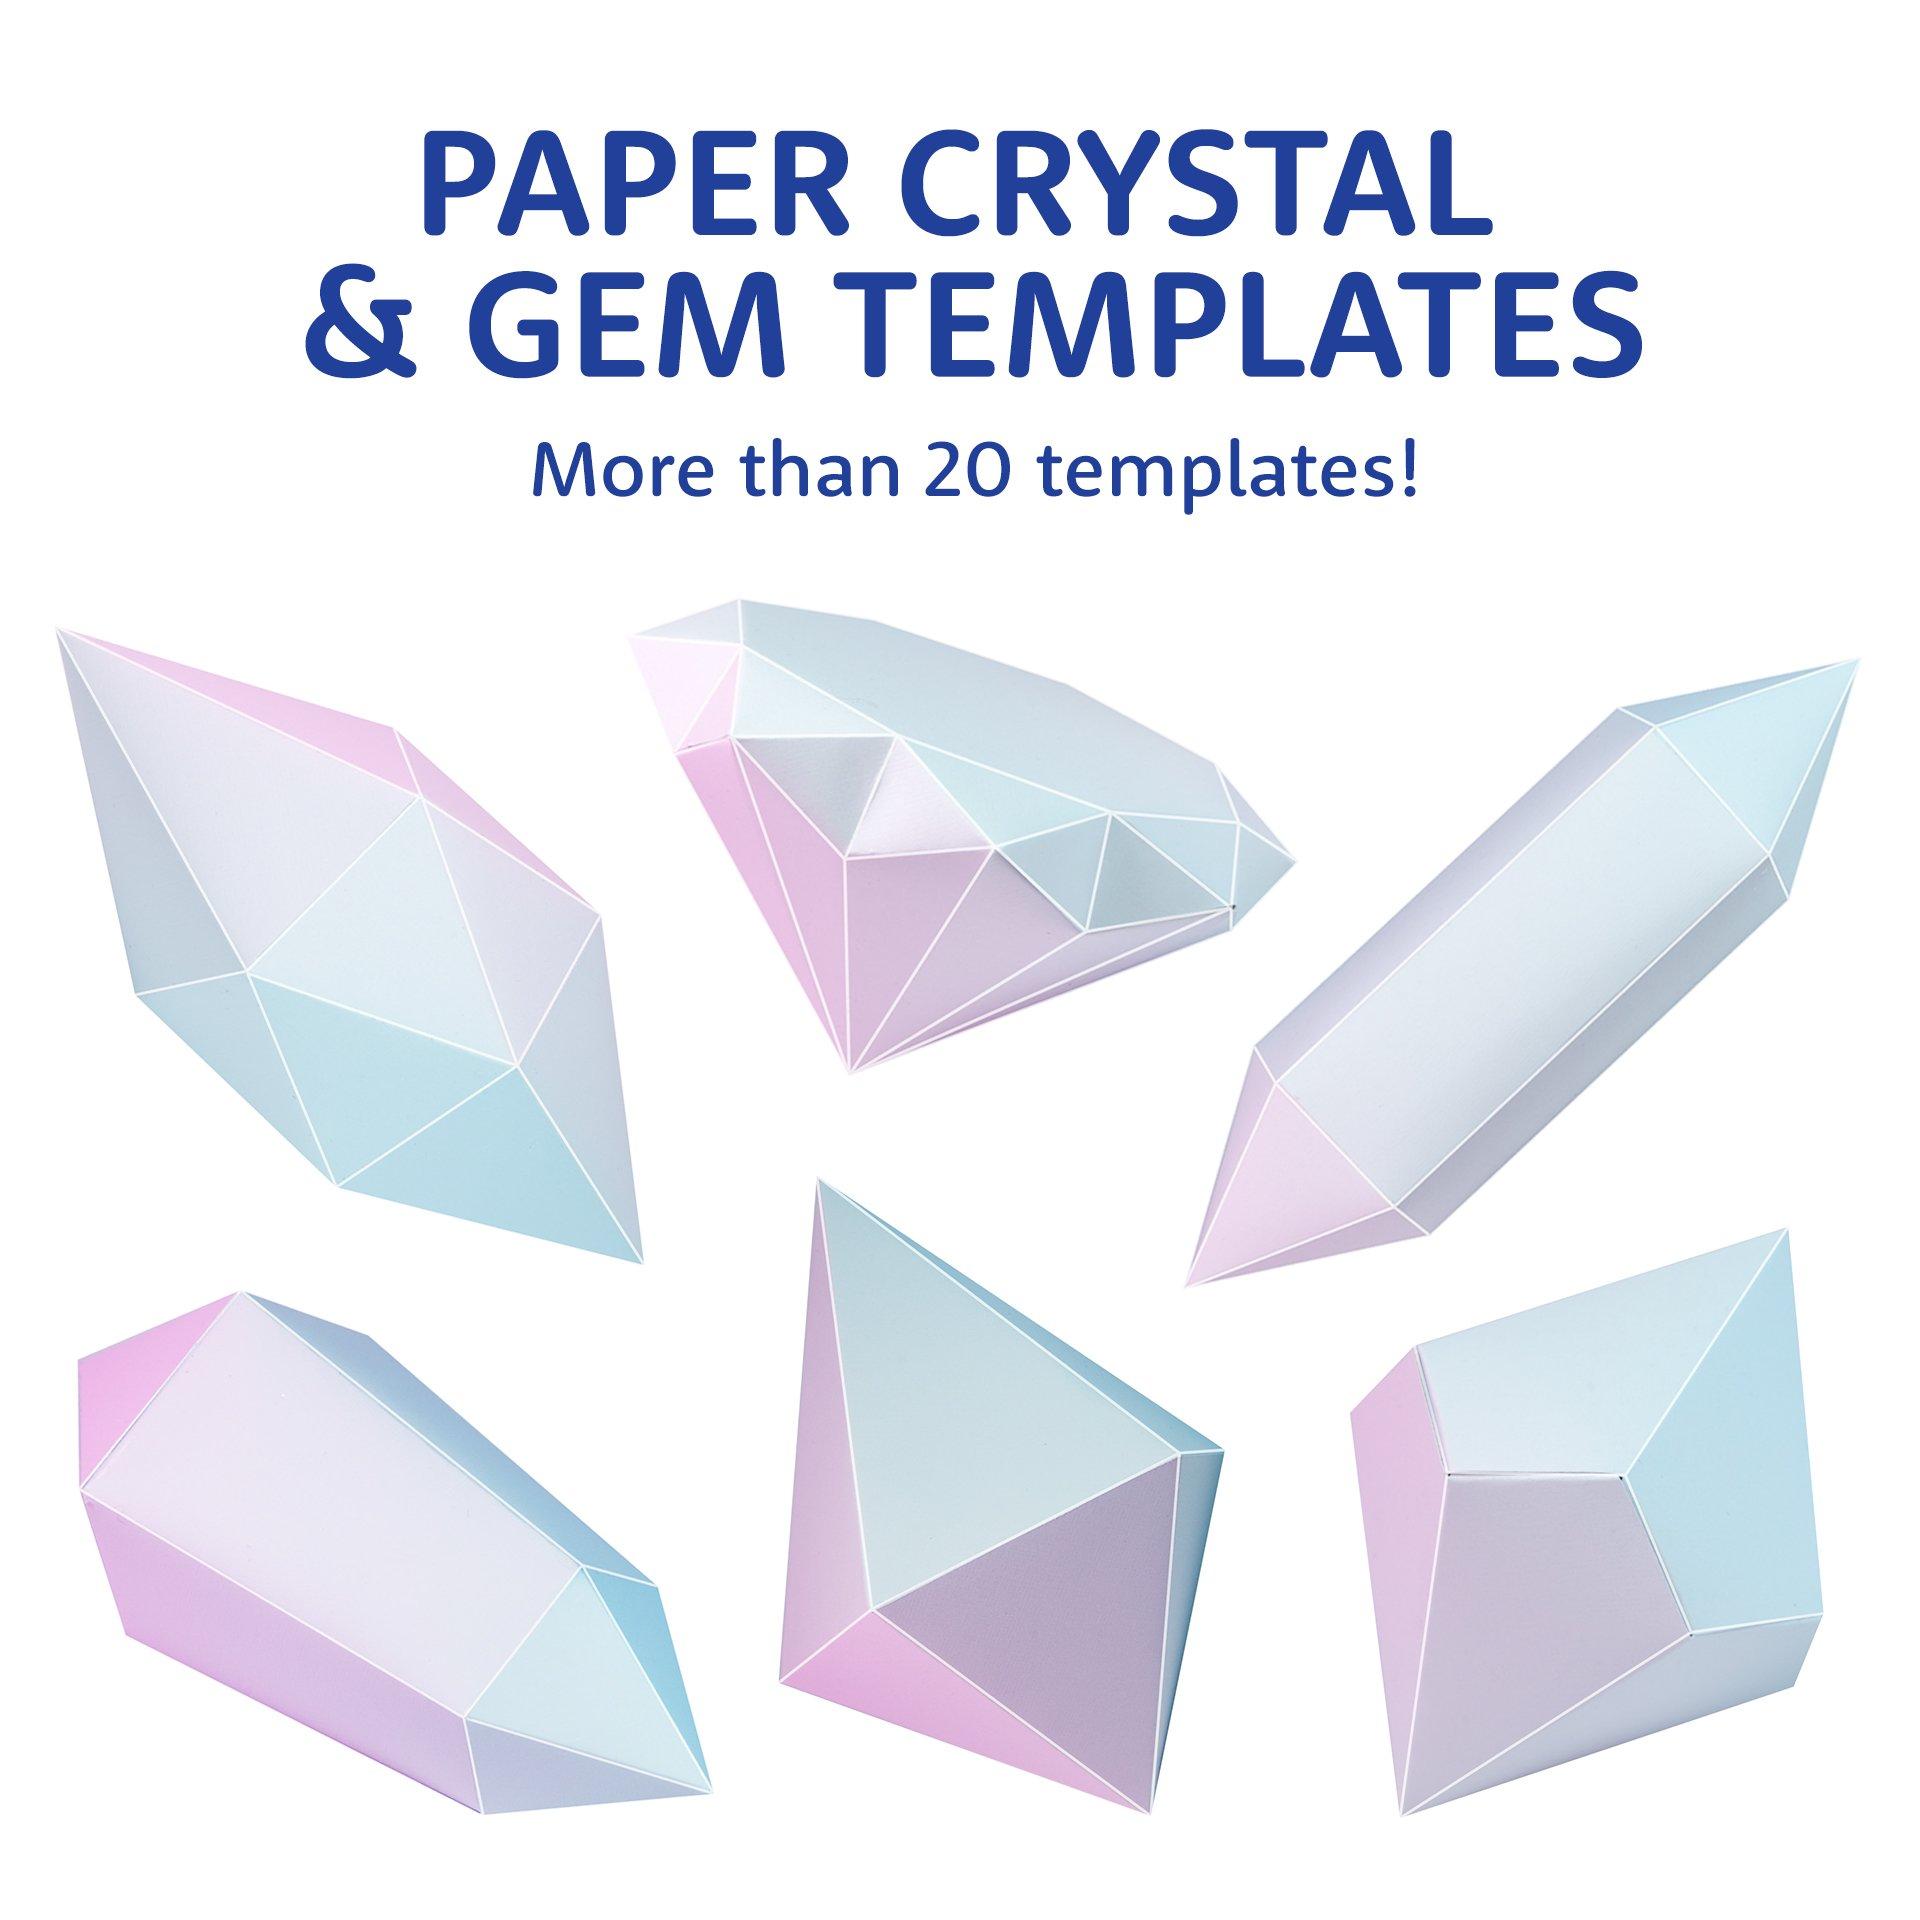 image regarding Printable Paper Templates identify Printable Paper Diamond, Gem Crystal Templates